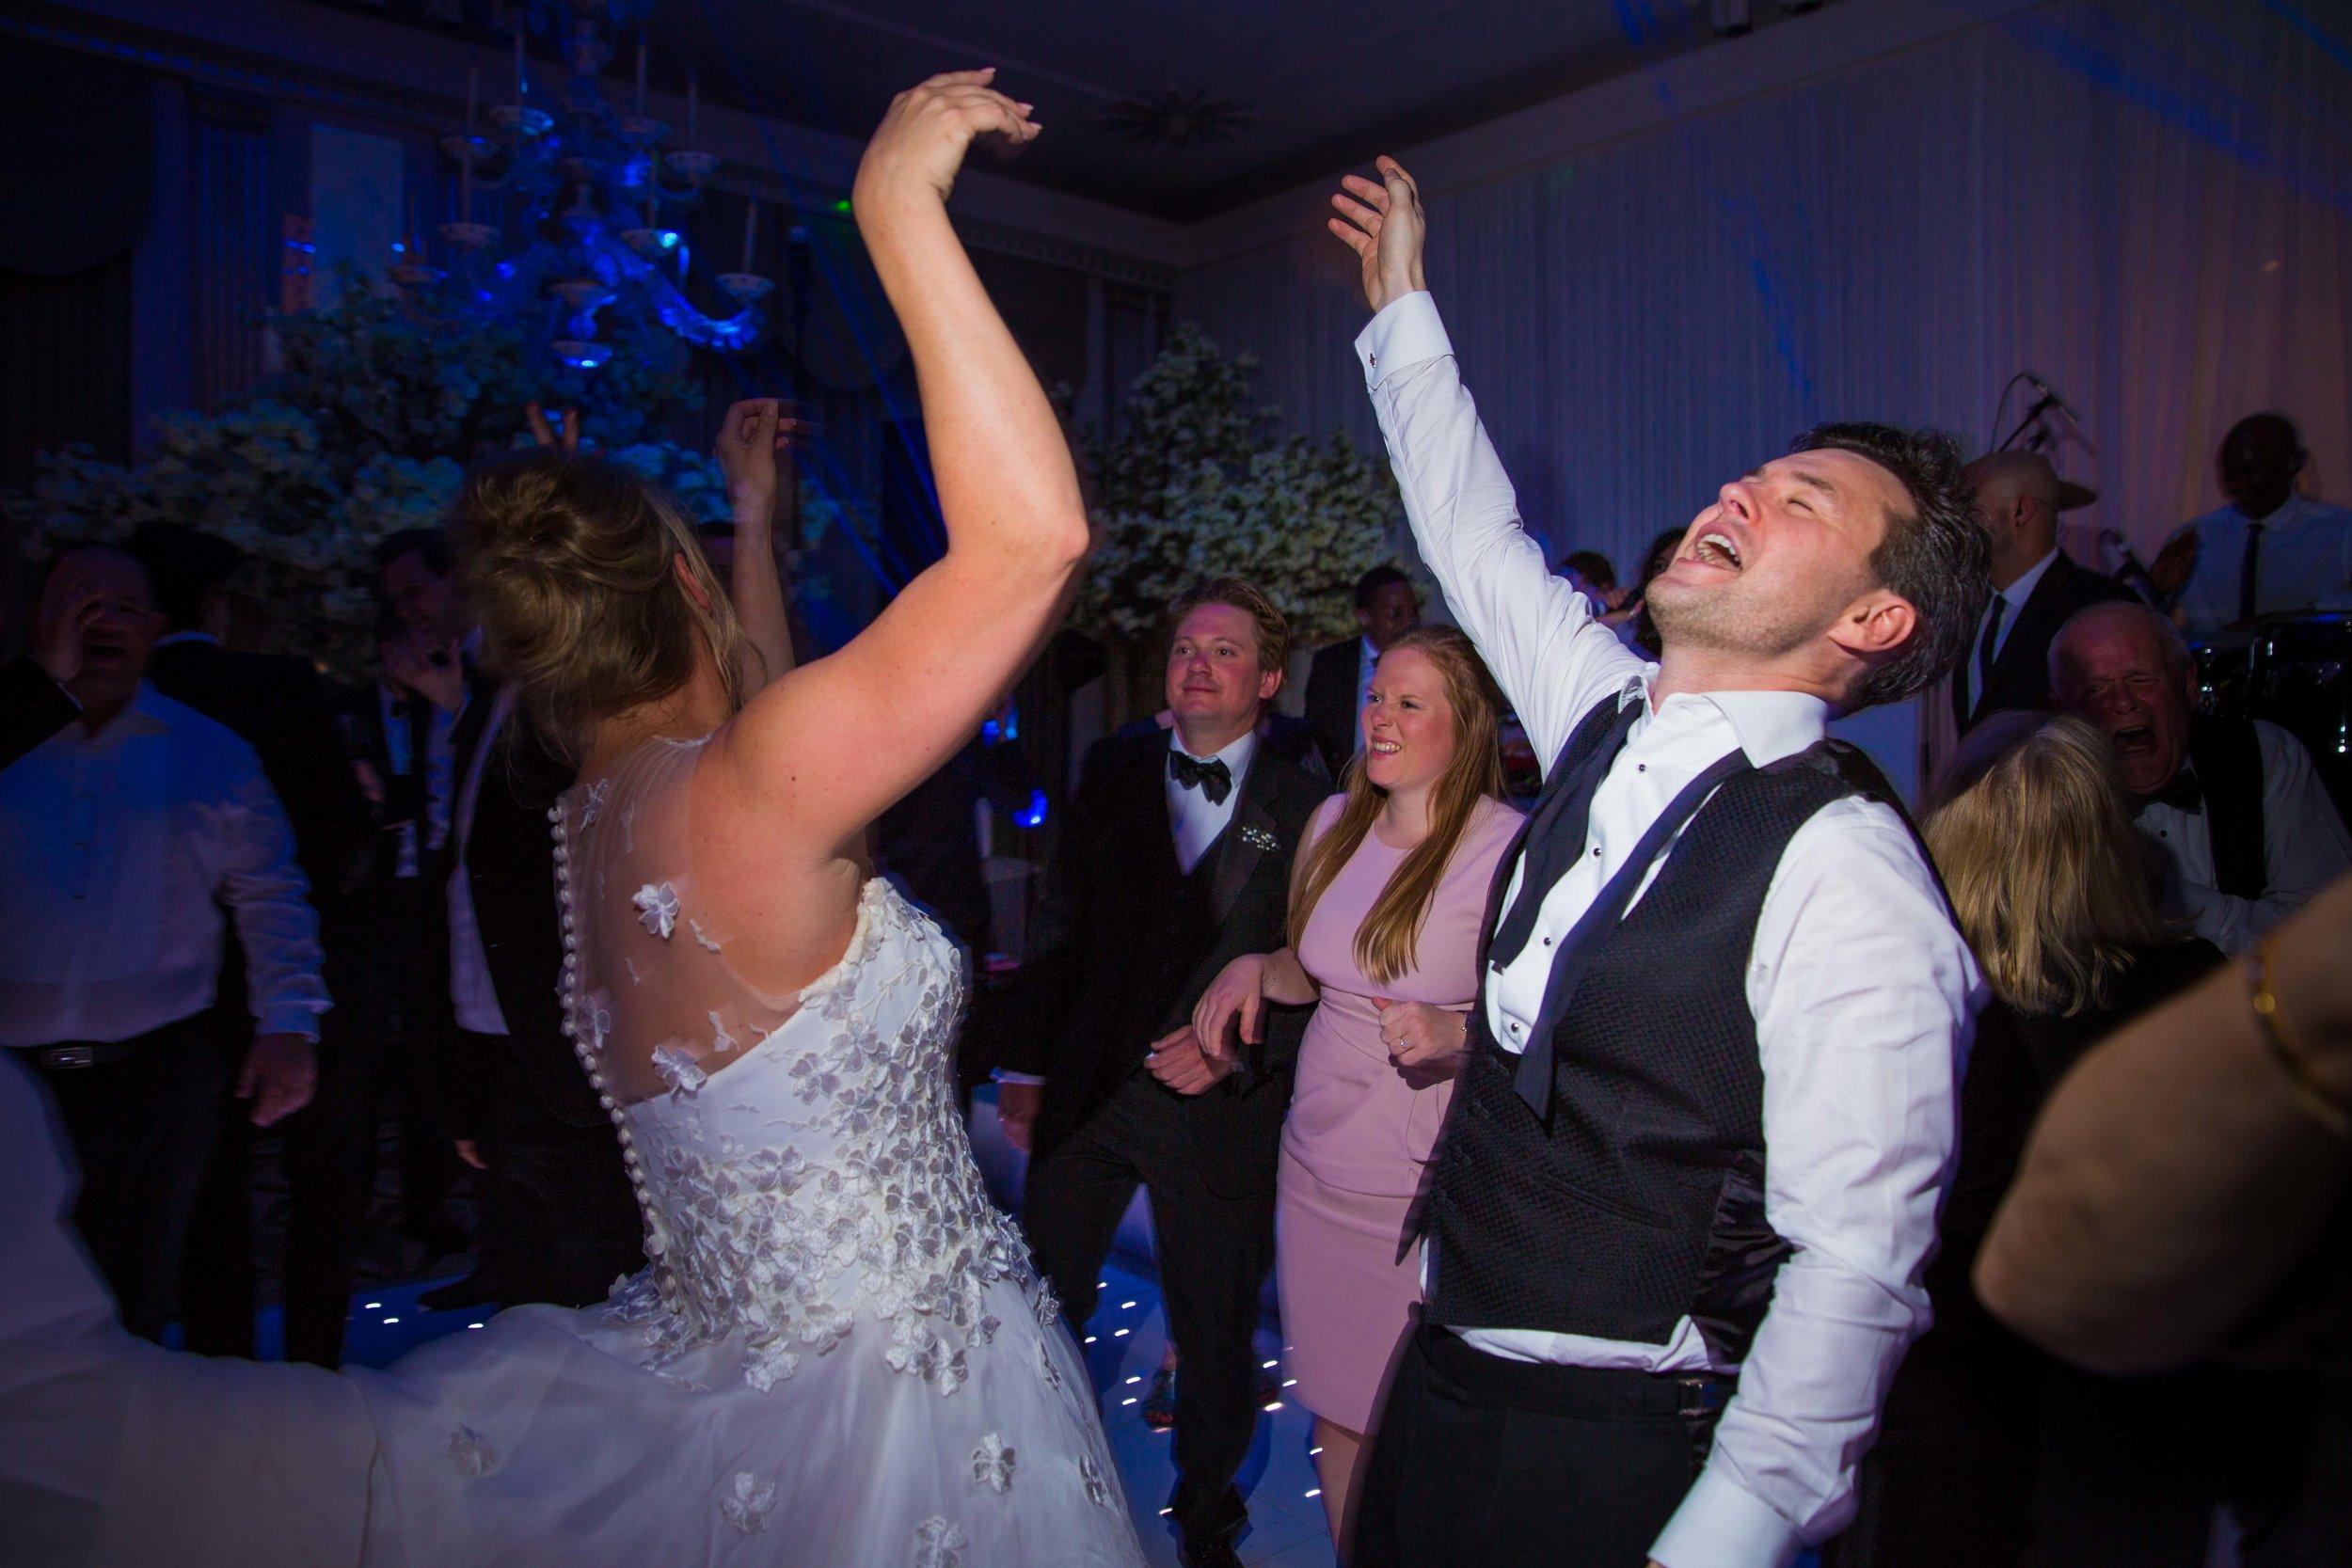 claridges-hotel-wedding-photographer-london-mayfair-natalia-smith-photography-161.jpg